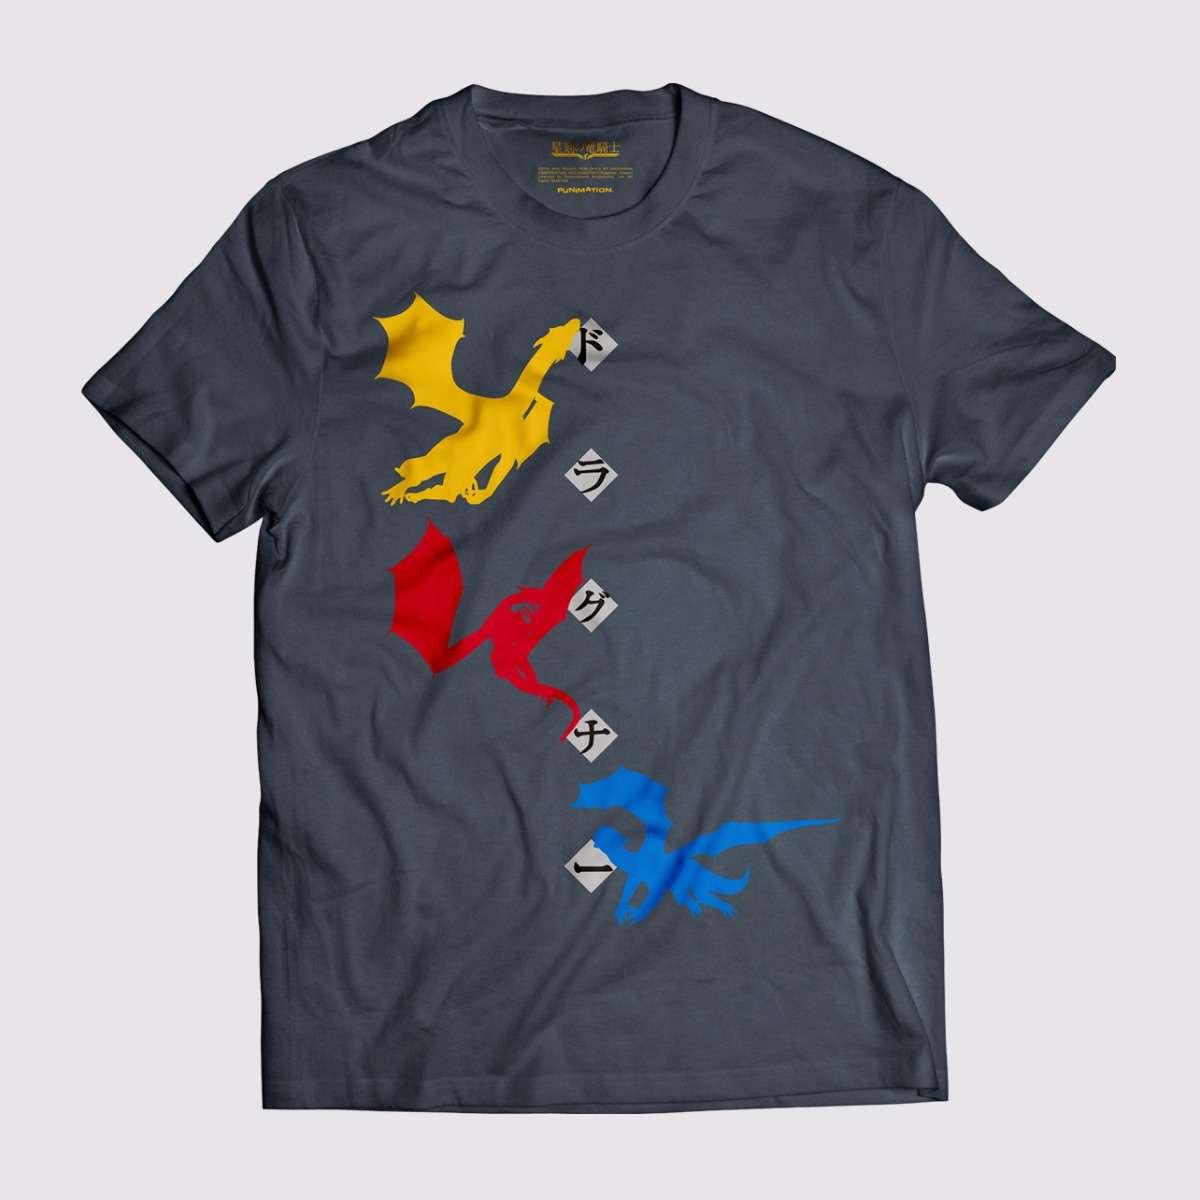 T-shirt - Triple Dragon apparel